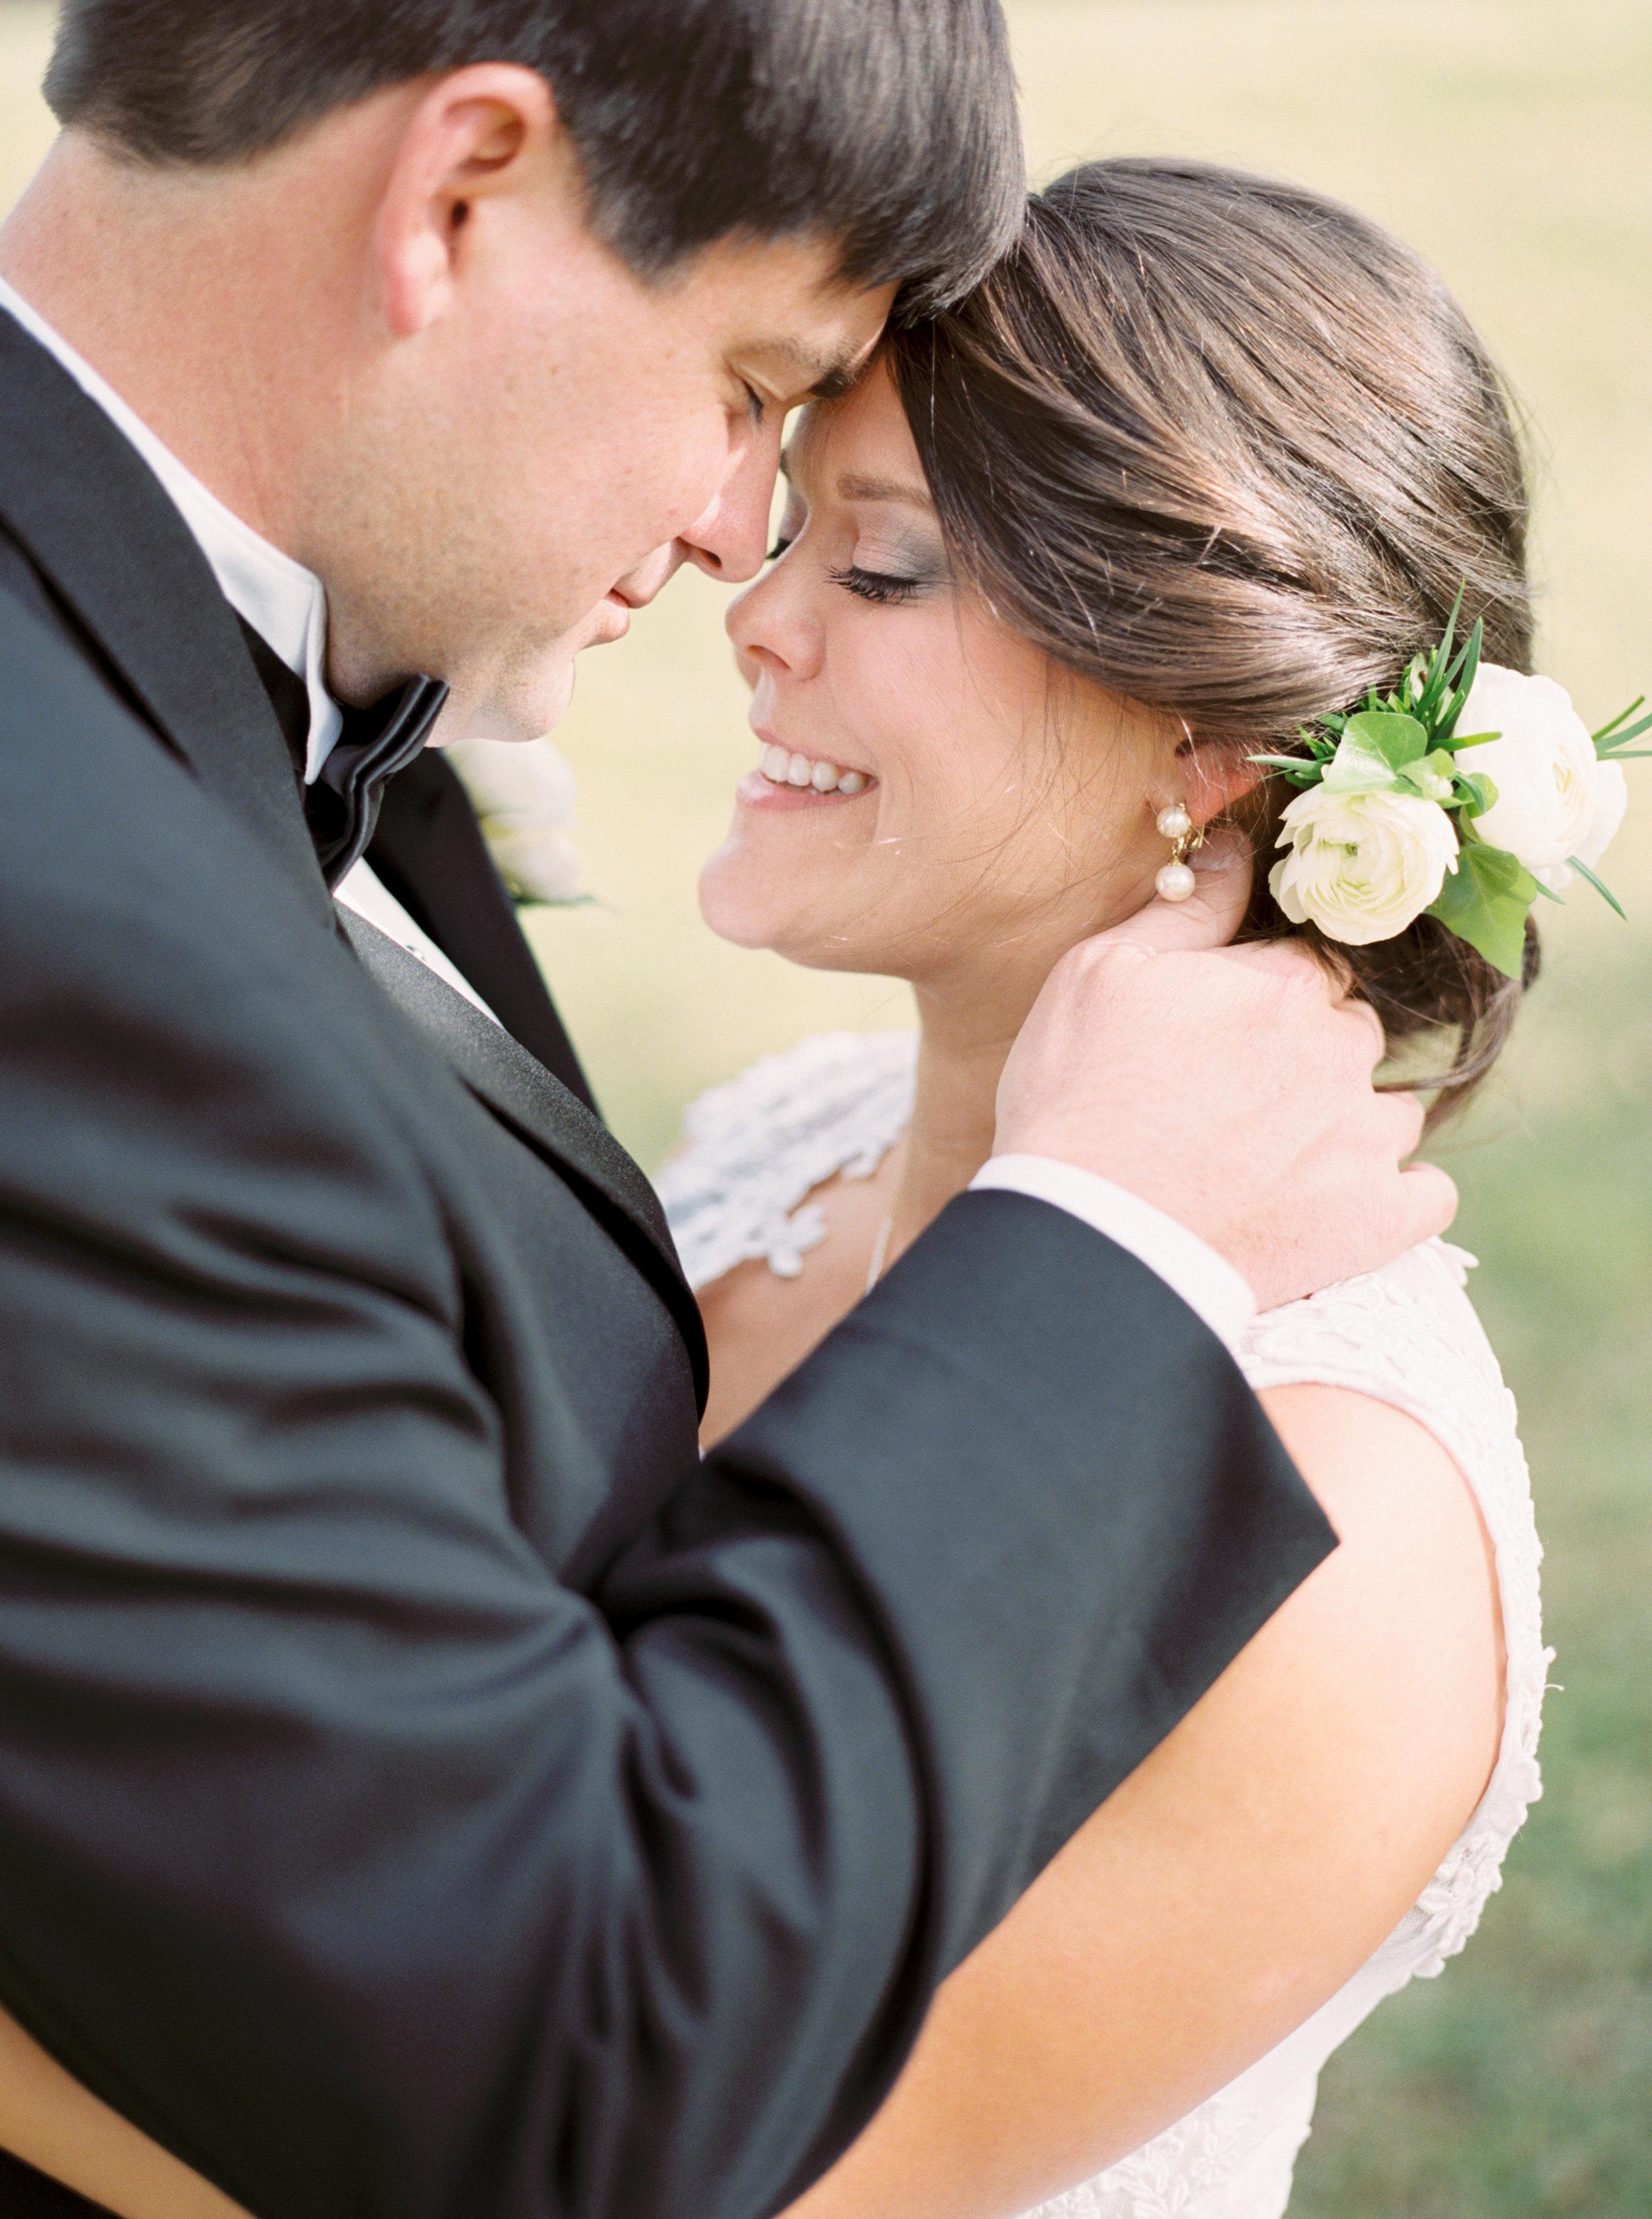 Fober_Wedding_Columbus_Georgia_Green_Island_Country_Club_Fallen_Photography_2b-83.JPG